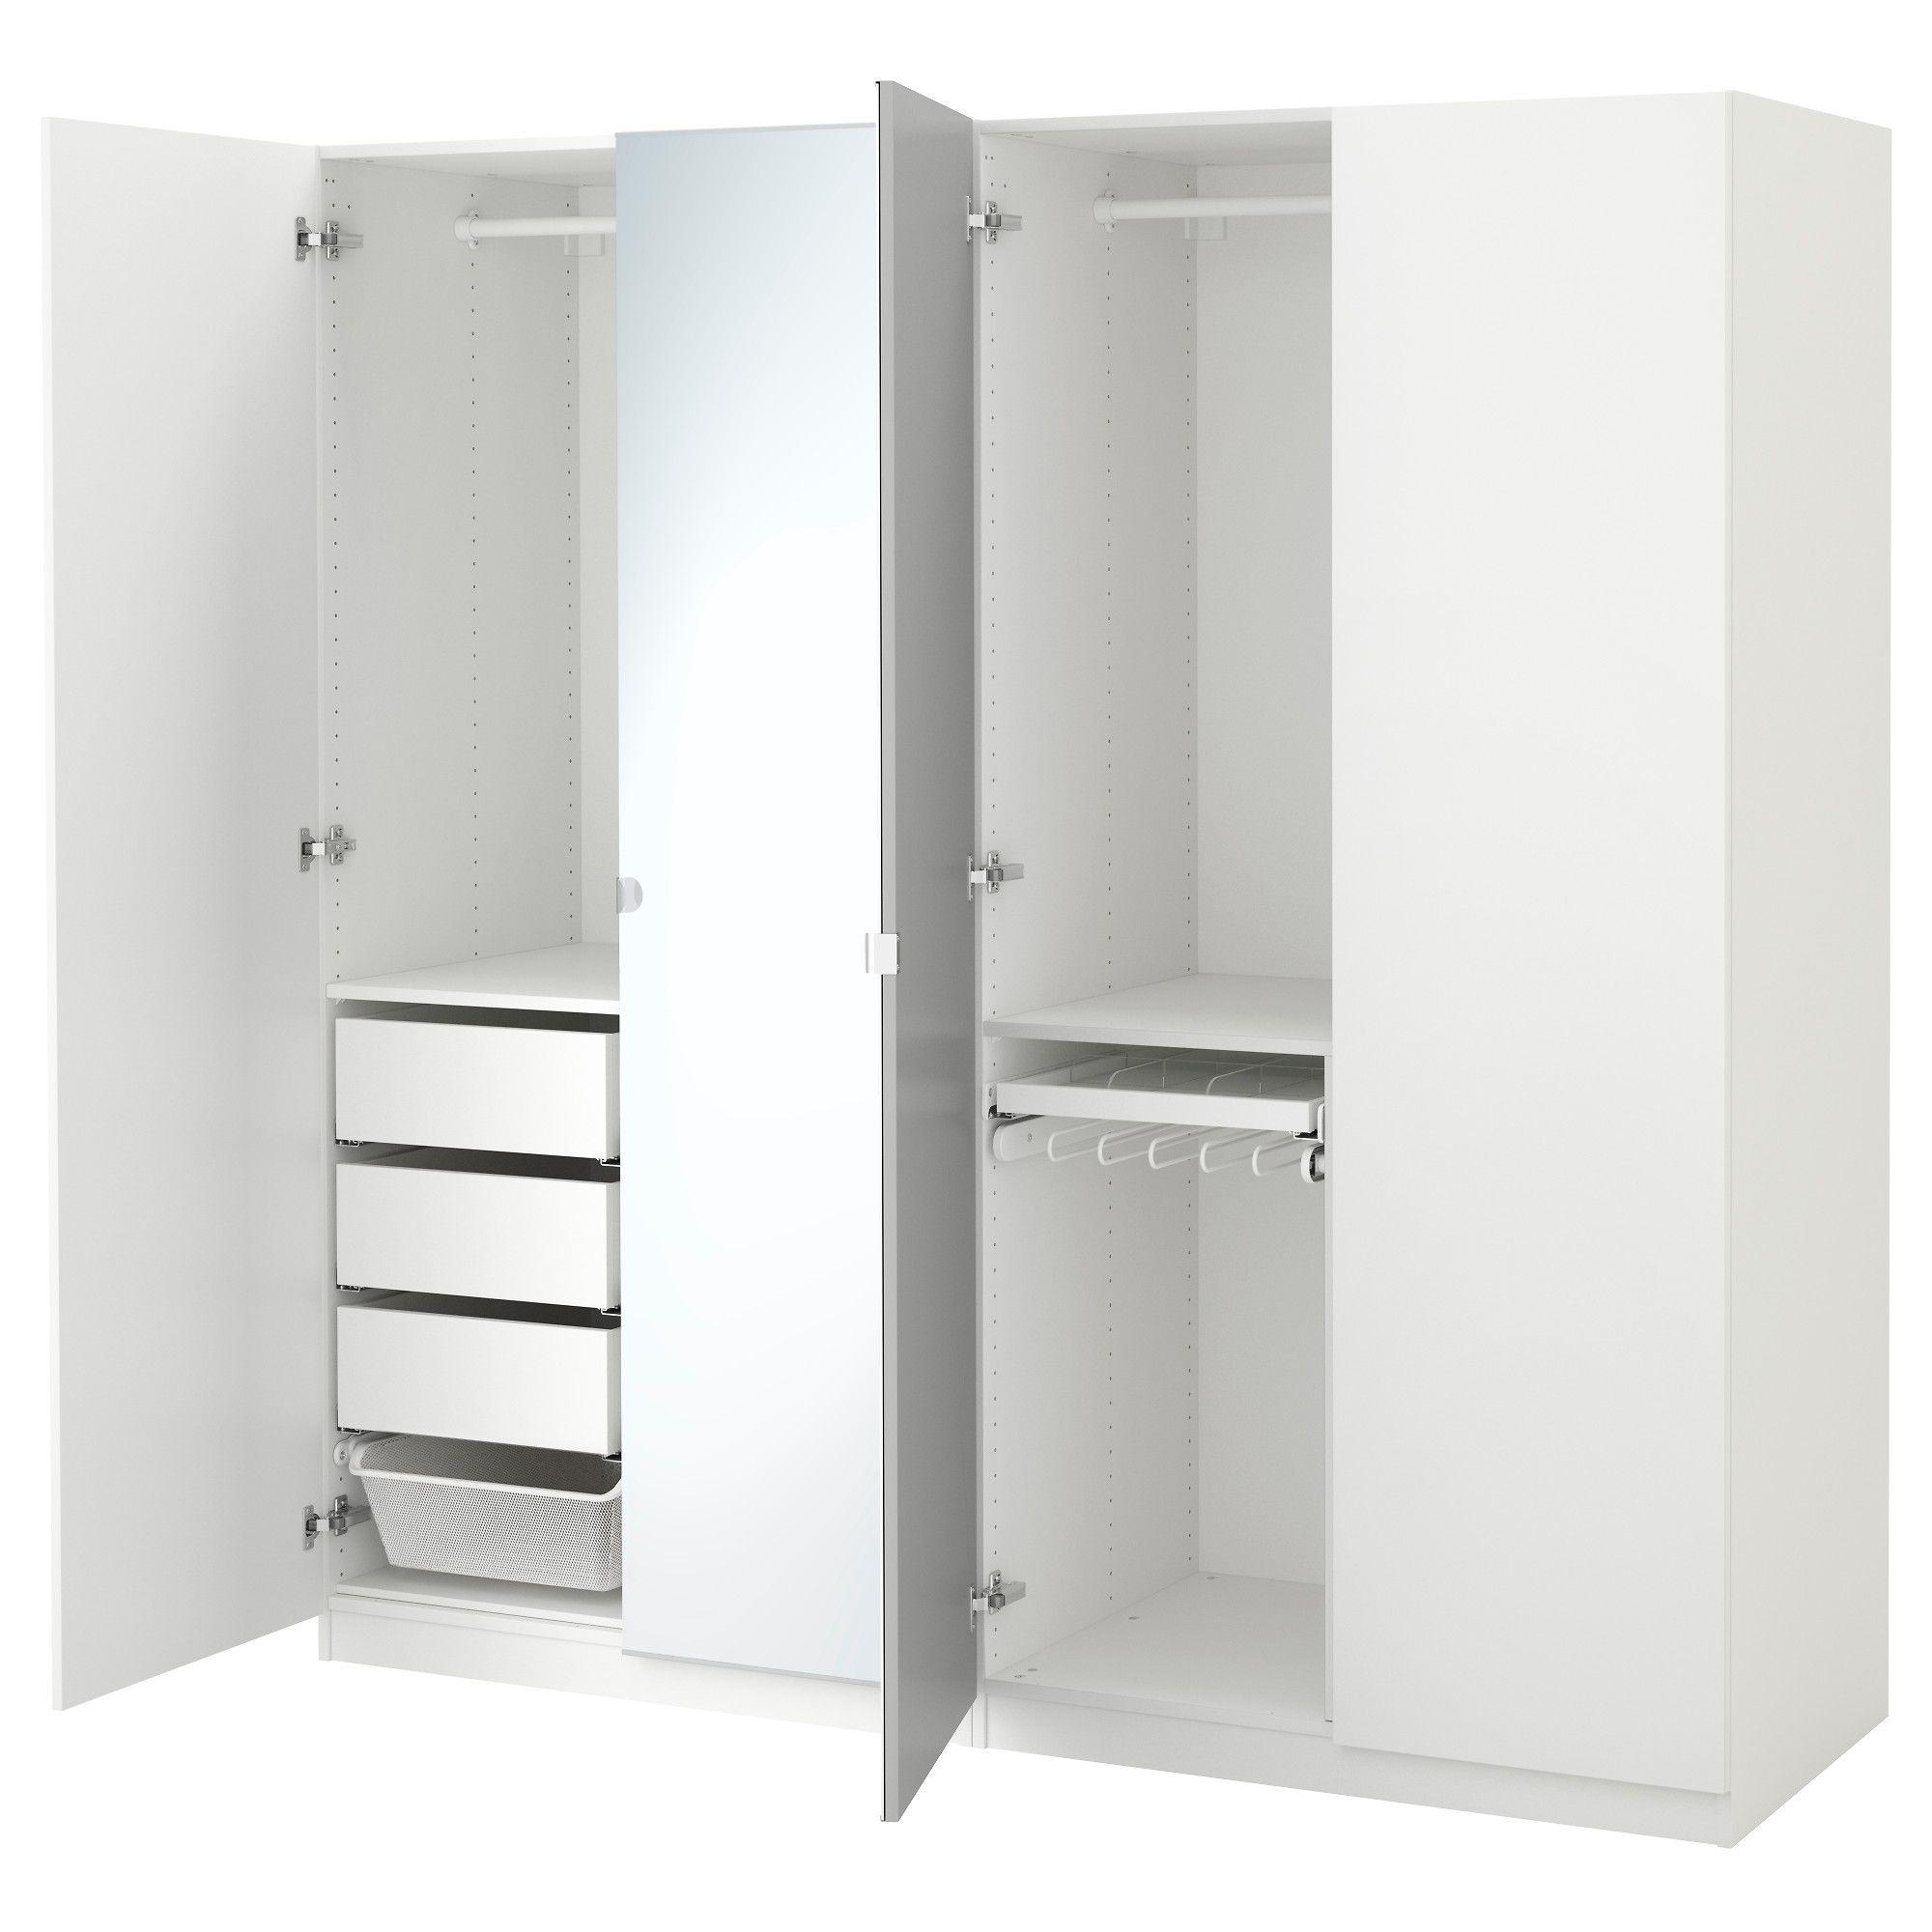 Ikea Pax White Forsand Vikedal Wardrobe In 2019 Pax